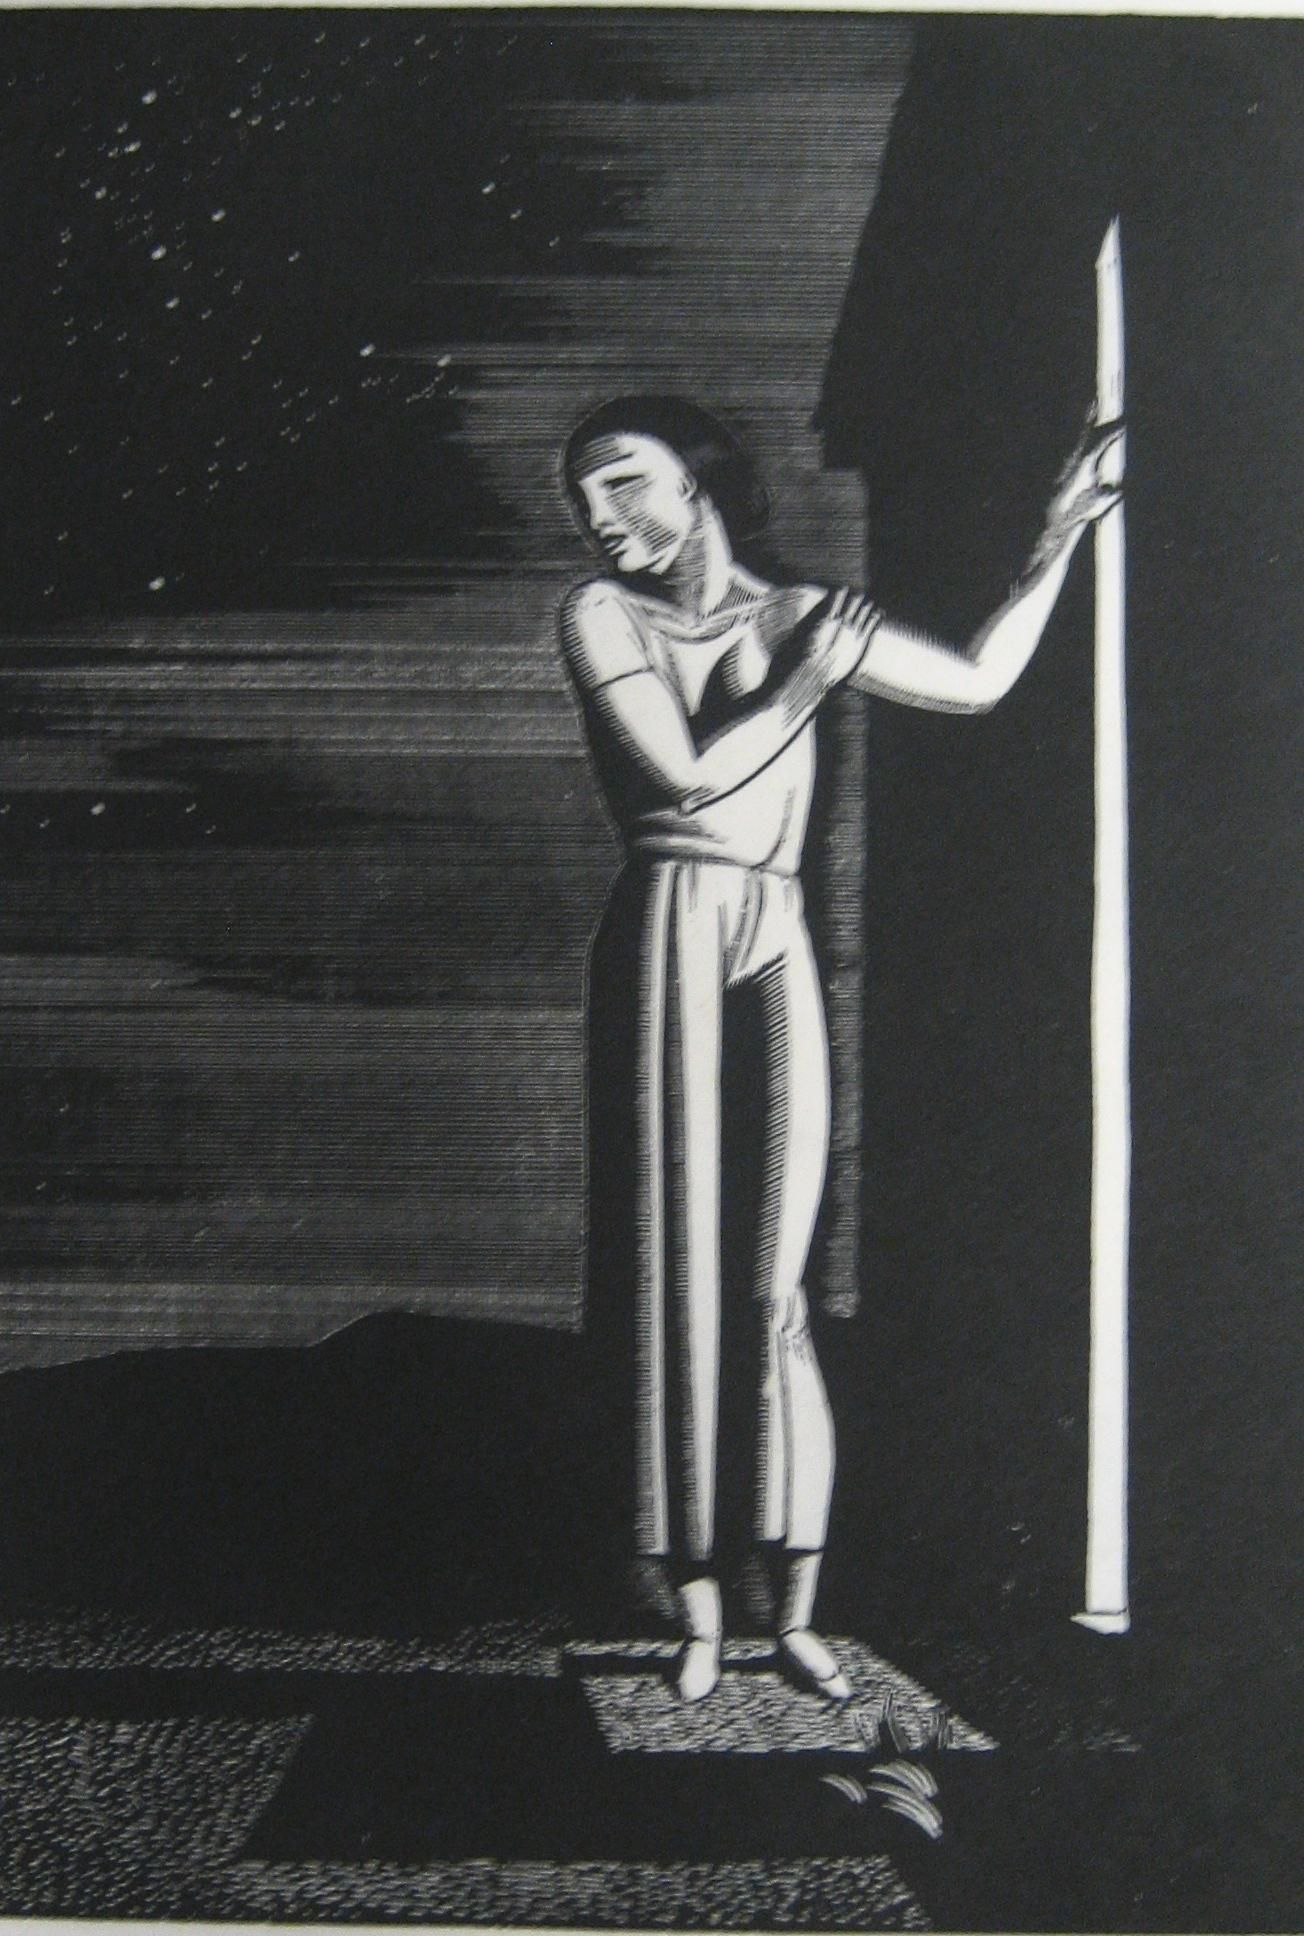 Kent rockwell 1882 1971 starry night